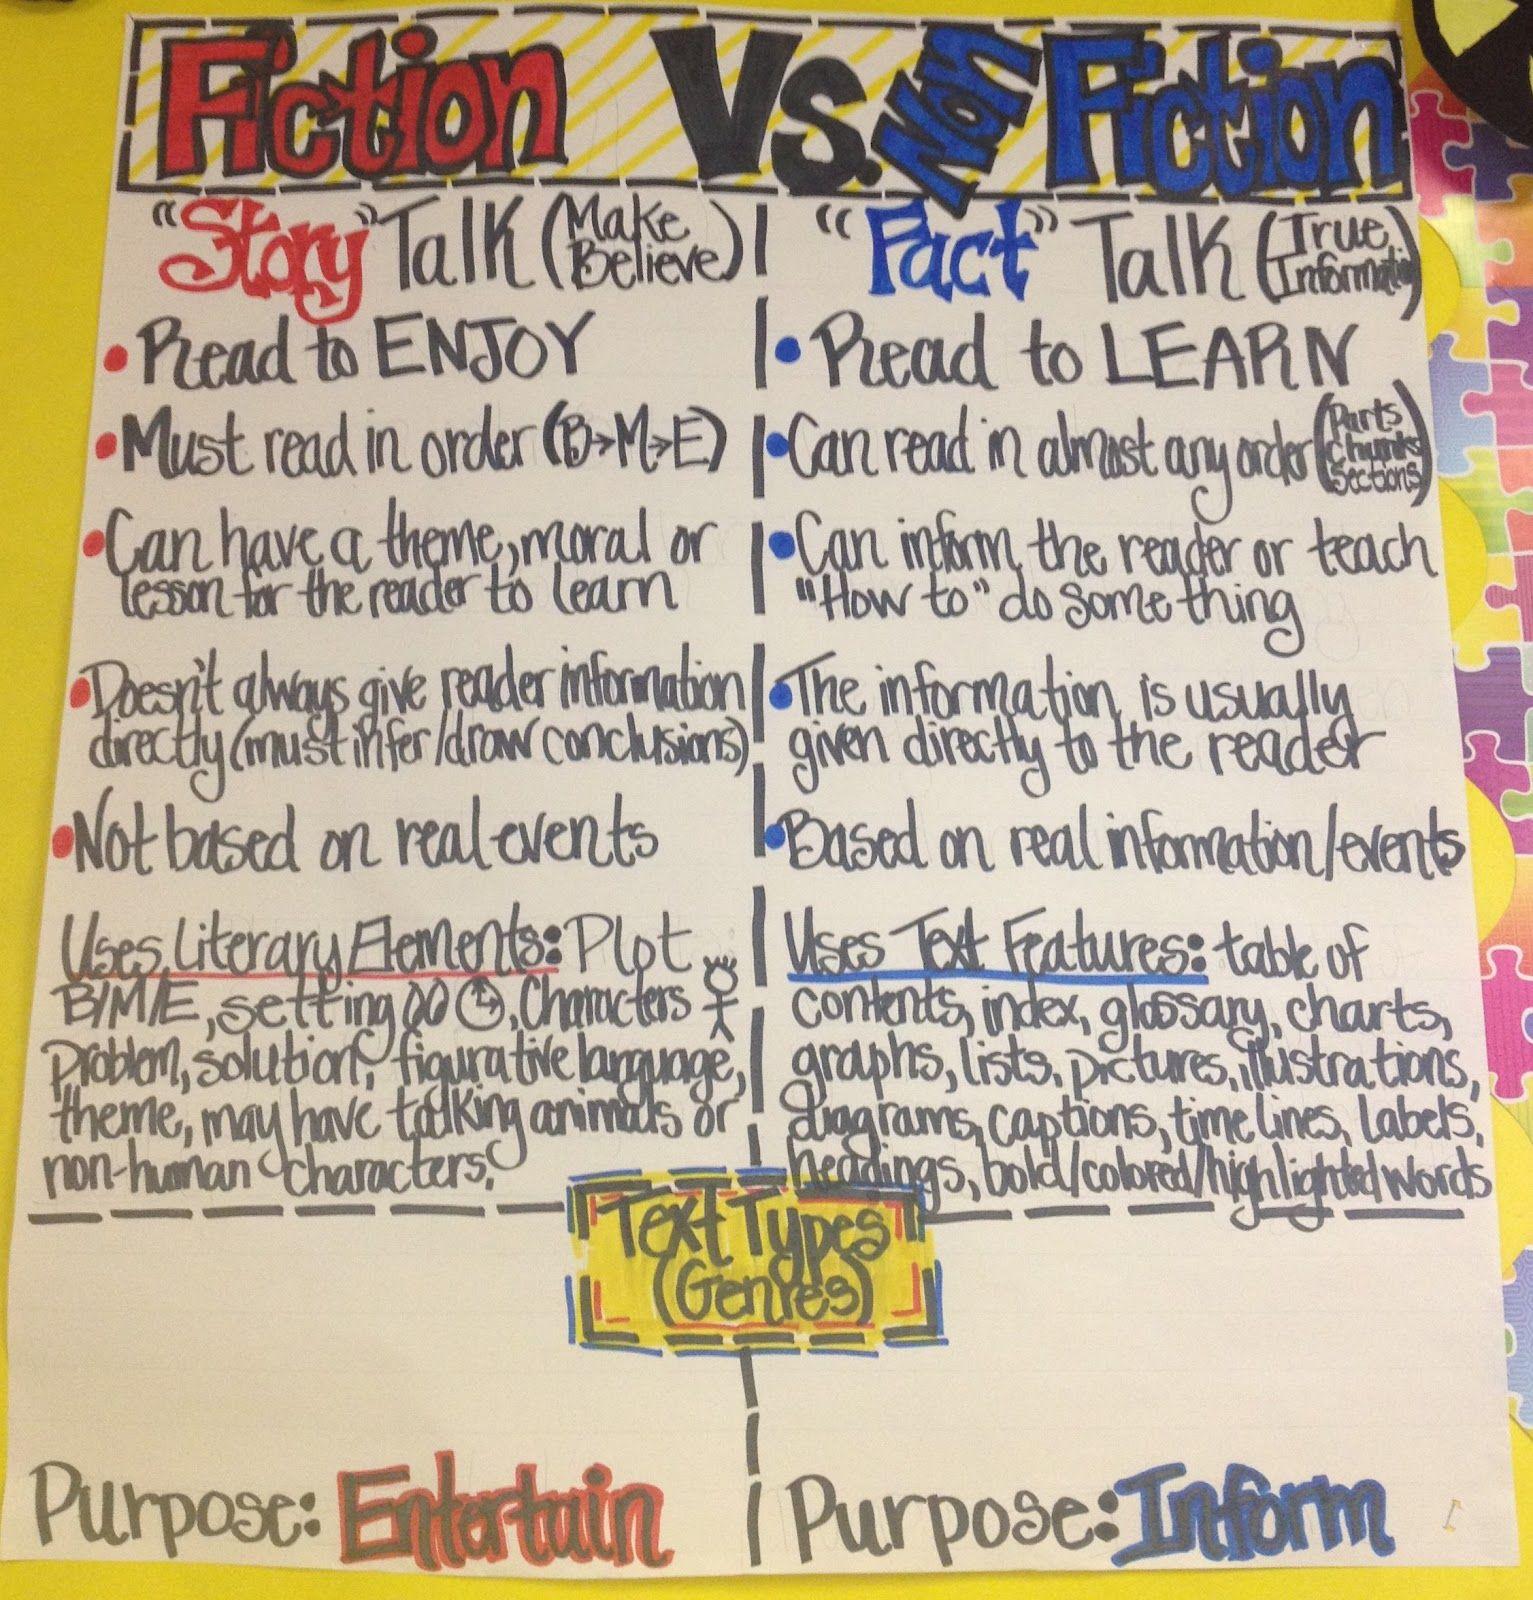 Fiction Vs Nonfiction Working 4 The Classroom Classroom